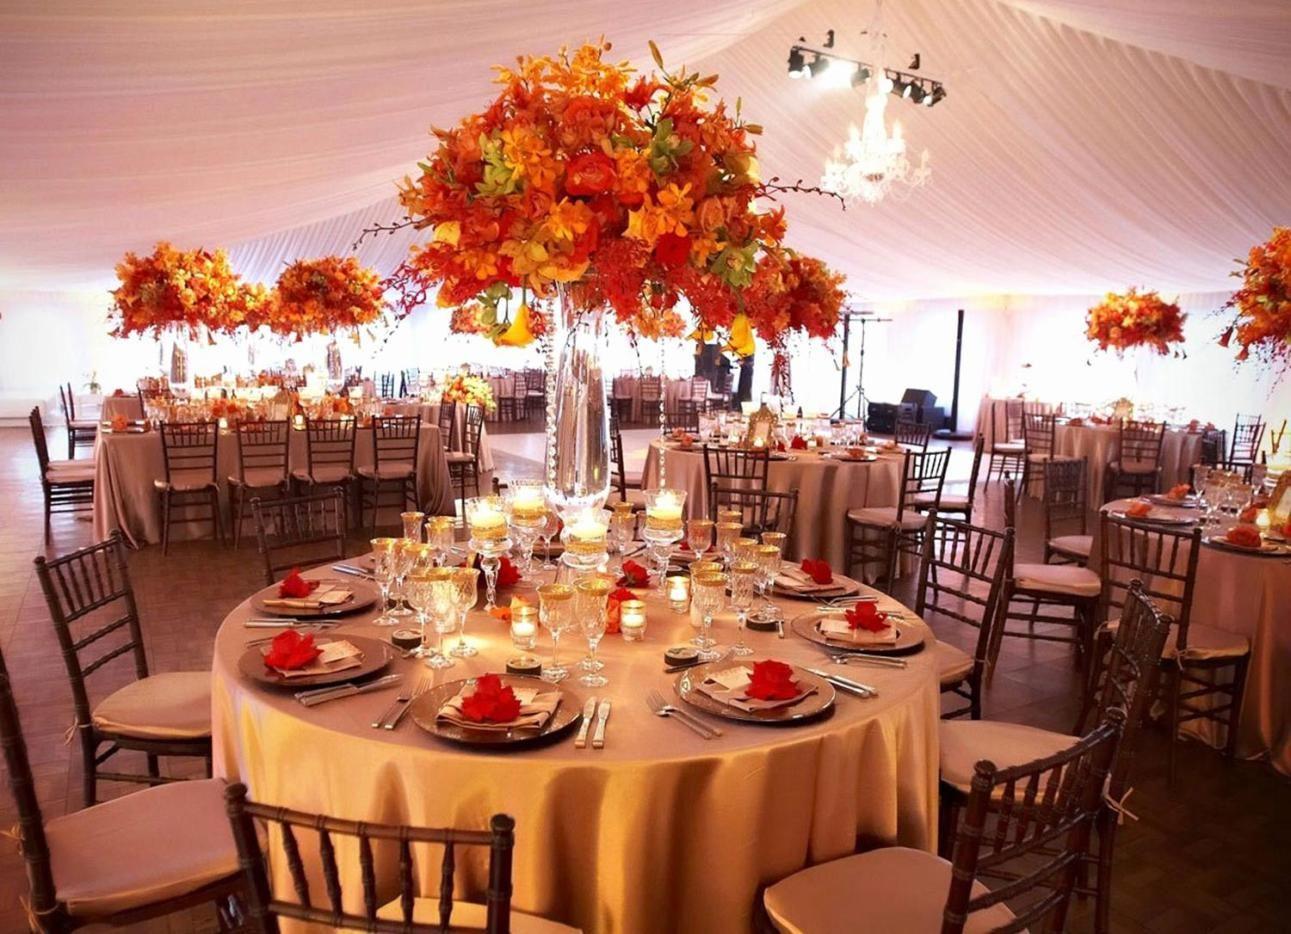 November wedding decoration ideas   Stunning Fall Wedding Themes Decorations Ideas  Wedding theme